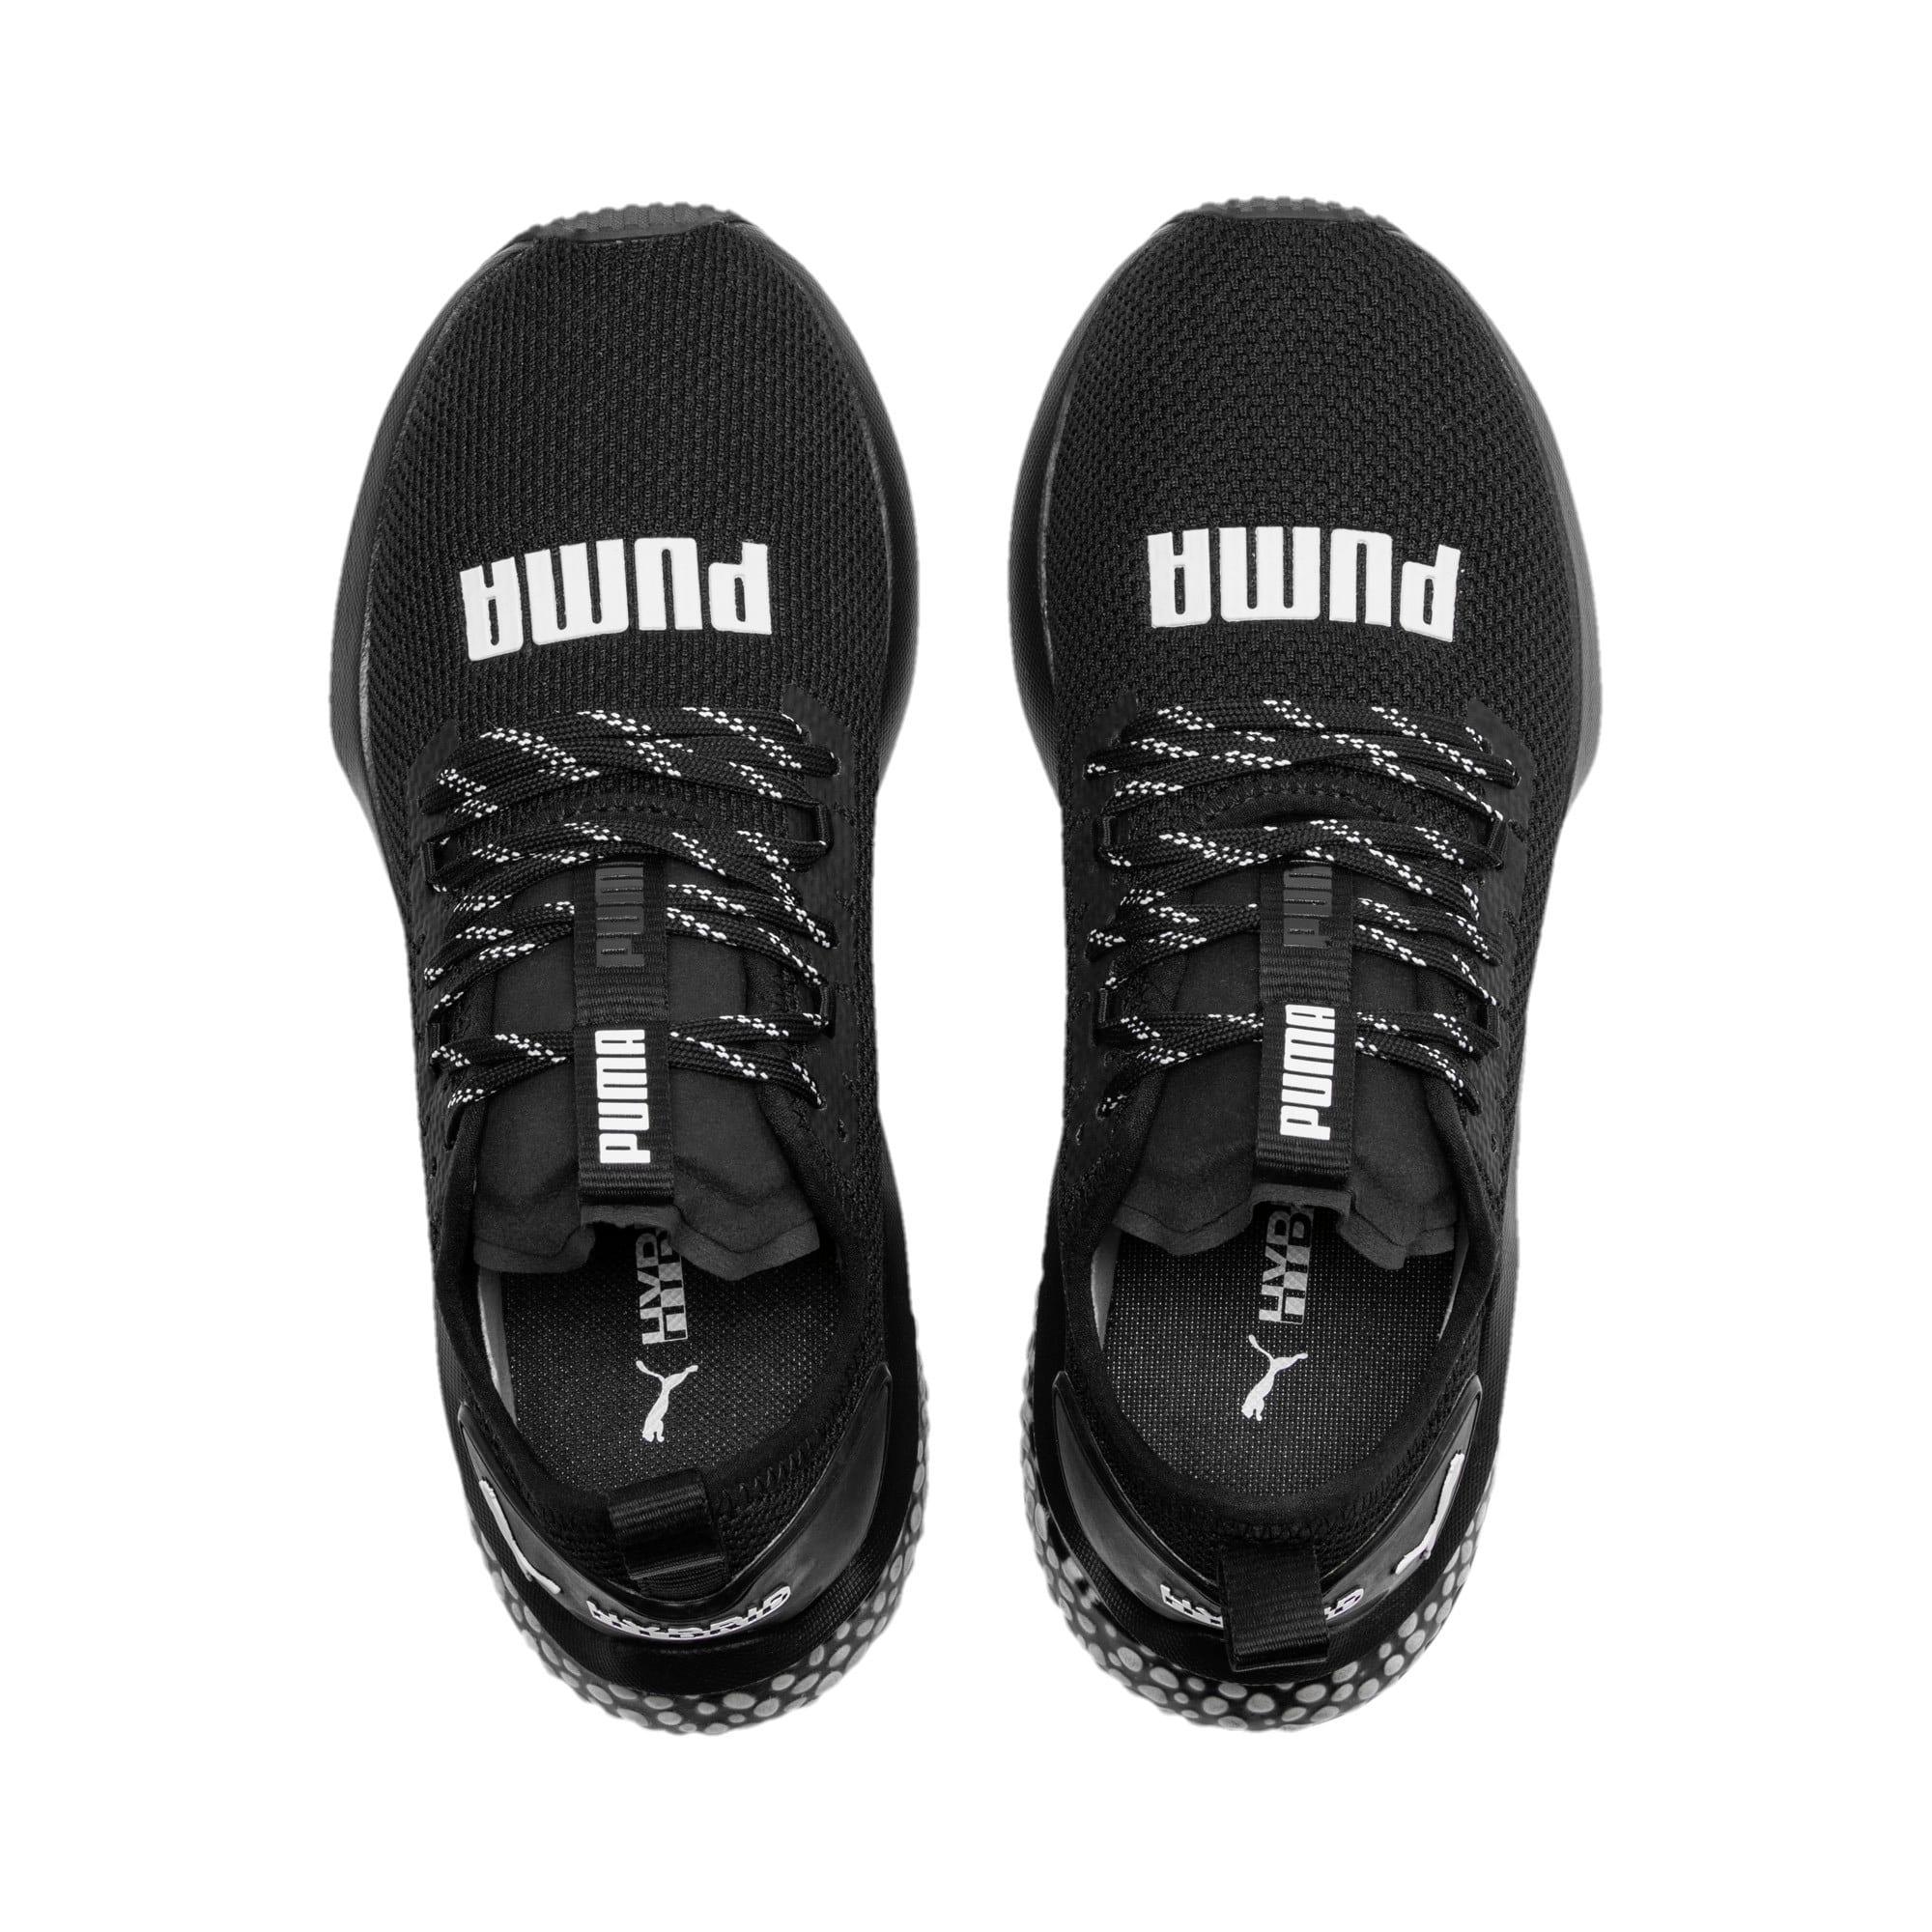 Thumbnail 7 of HYBRID NX Women's Running Shoes, Puma Black-Puma White, medium